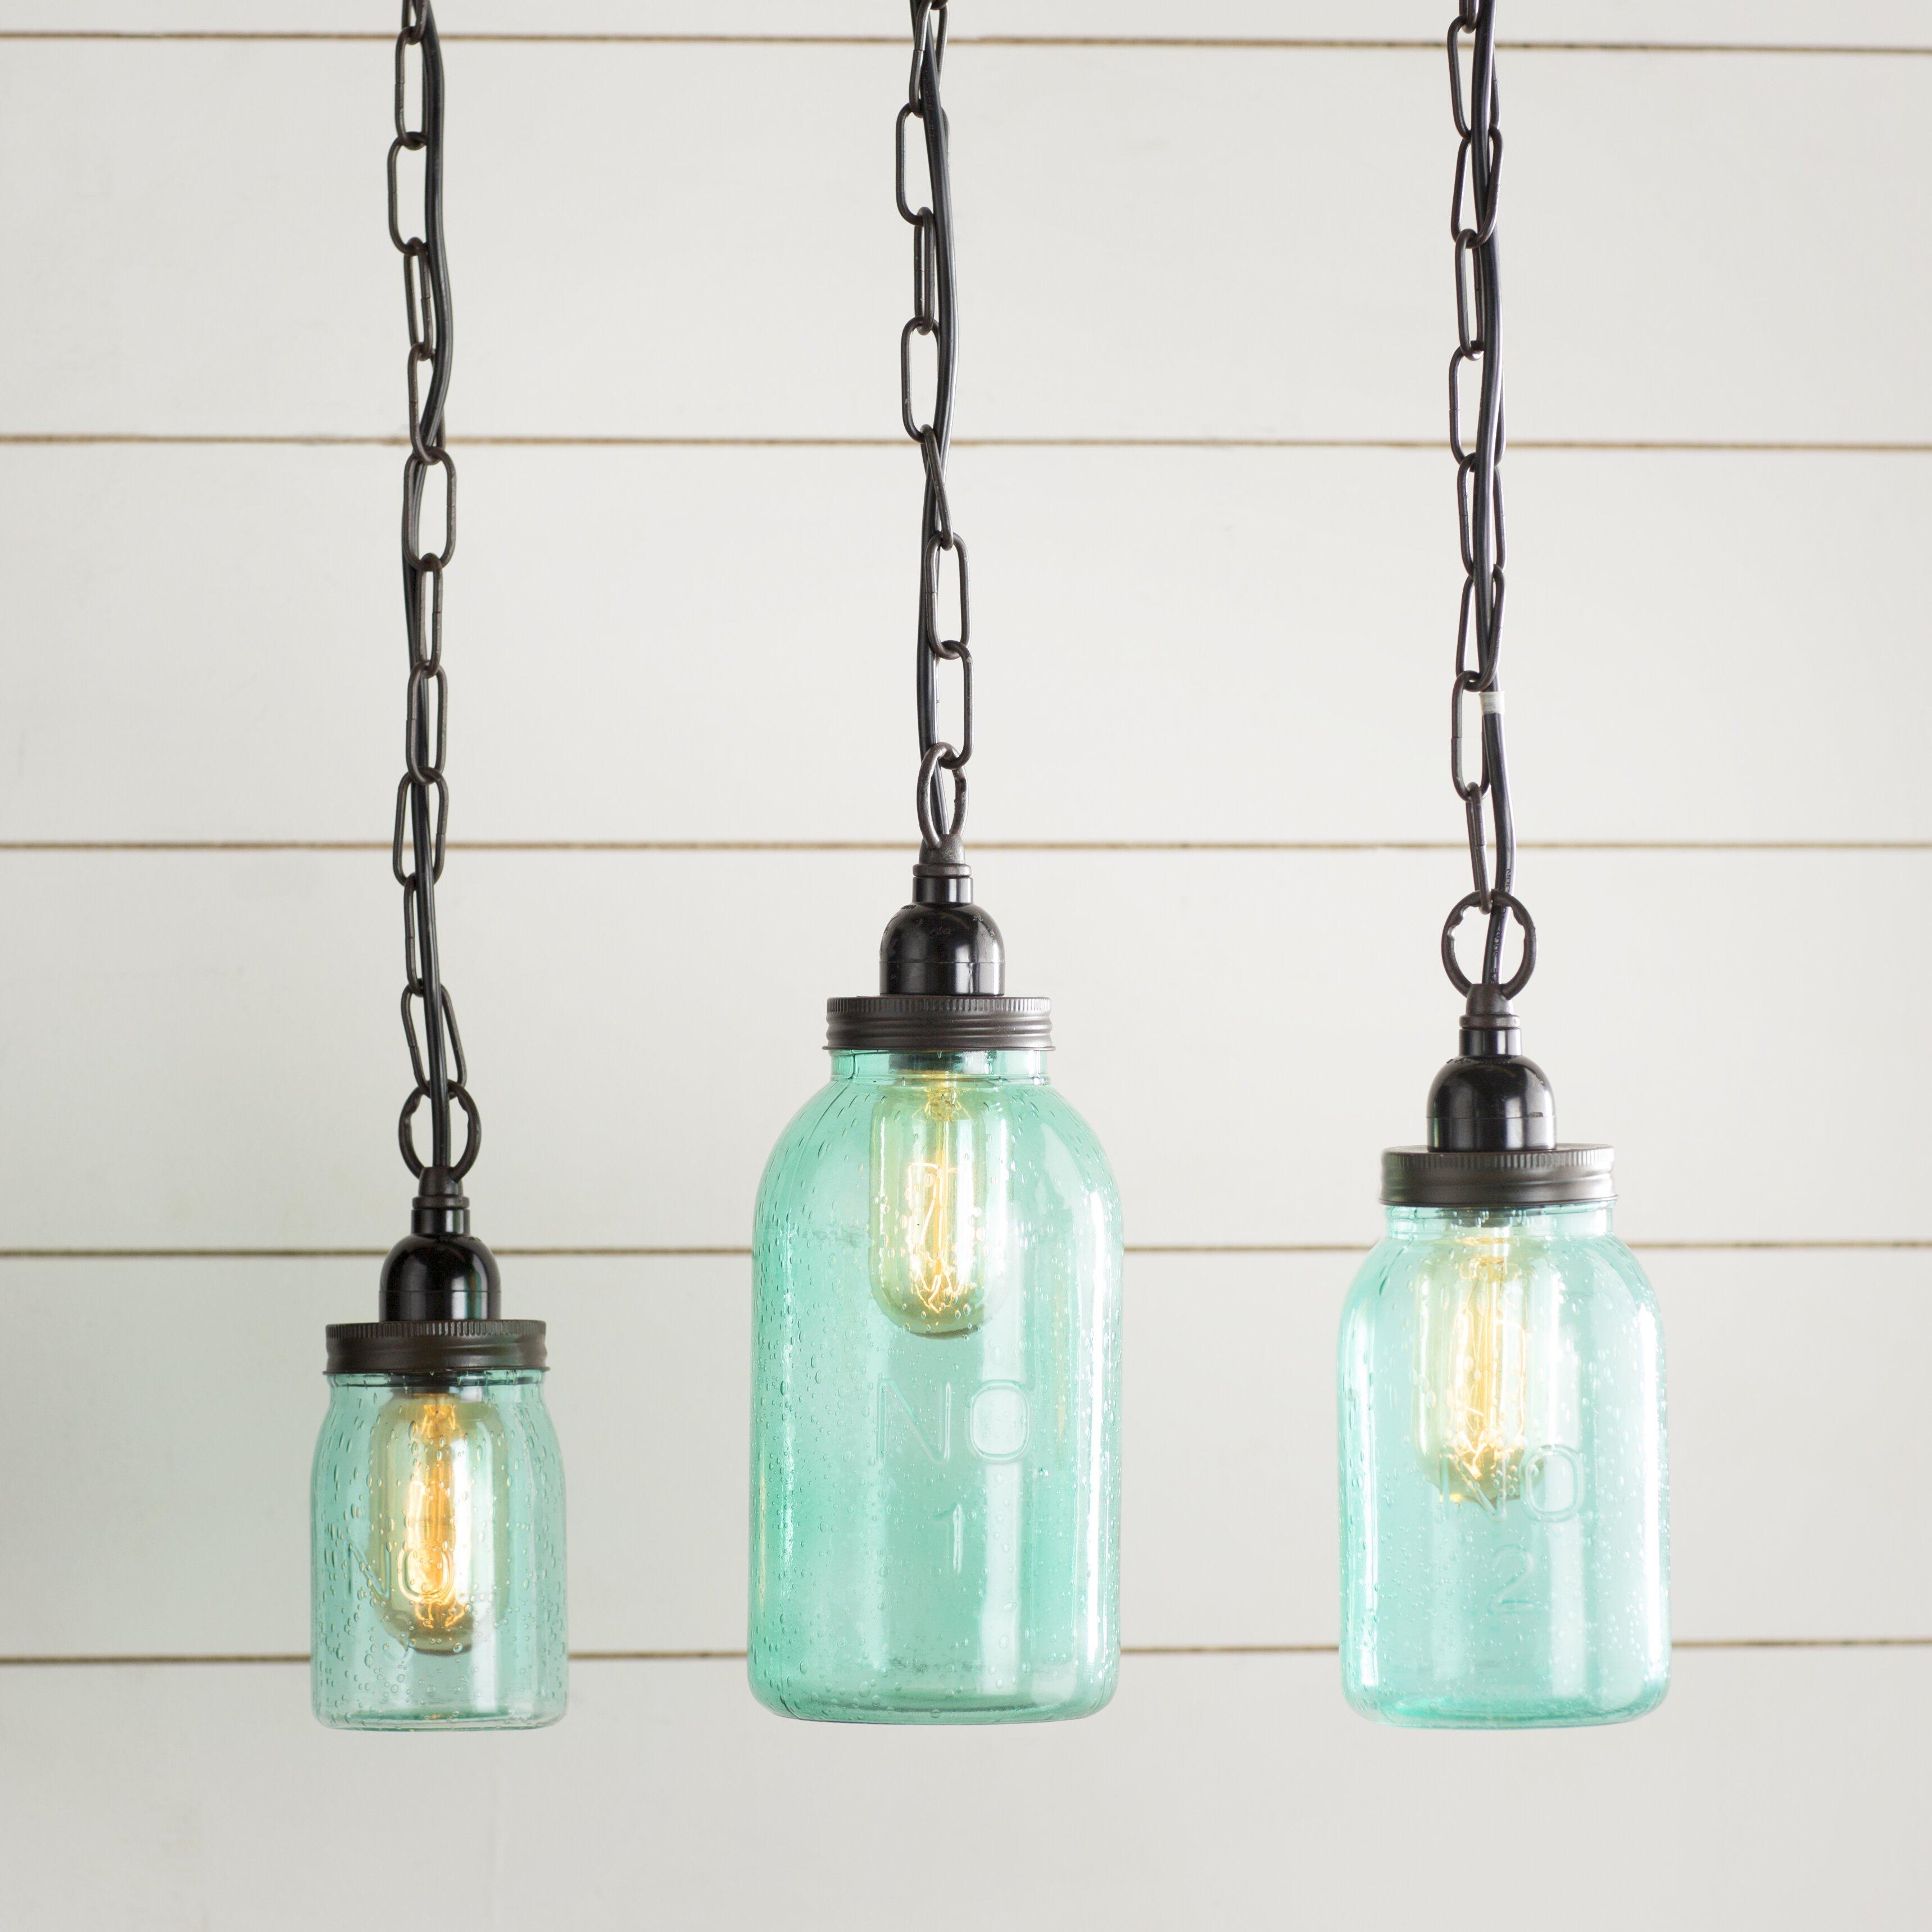 Stargaze Set Of 2 Hanging Mason Jar Pendant Lights By: Norgate 3 Piece Mason Jar Mini Pendant Set